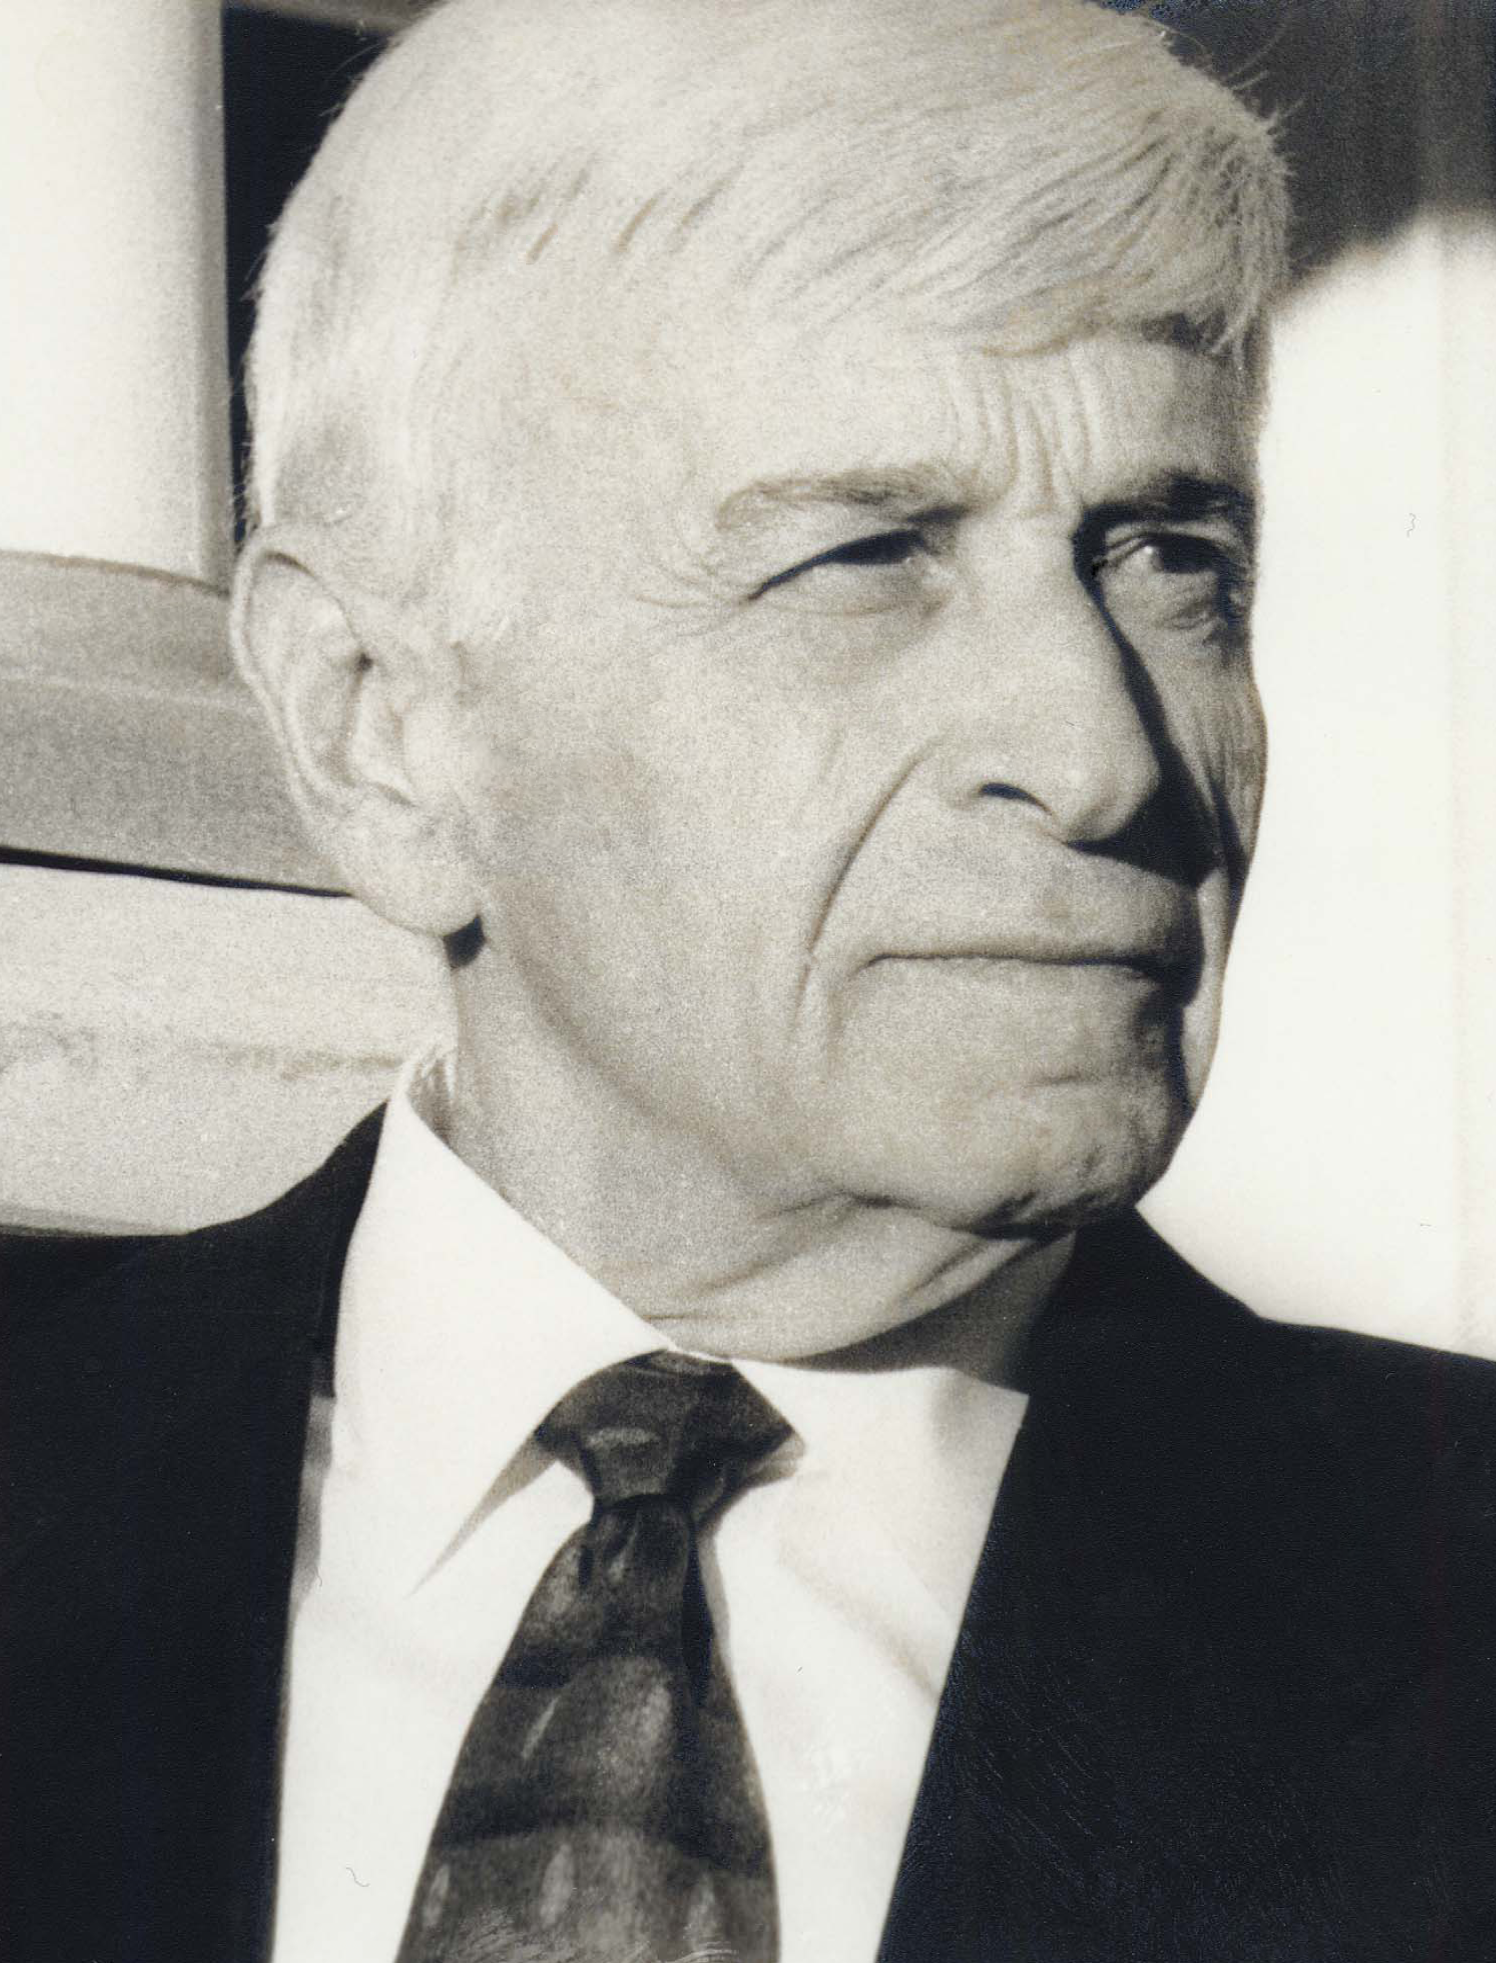 Max Eisen Black and White Headshot